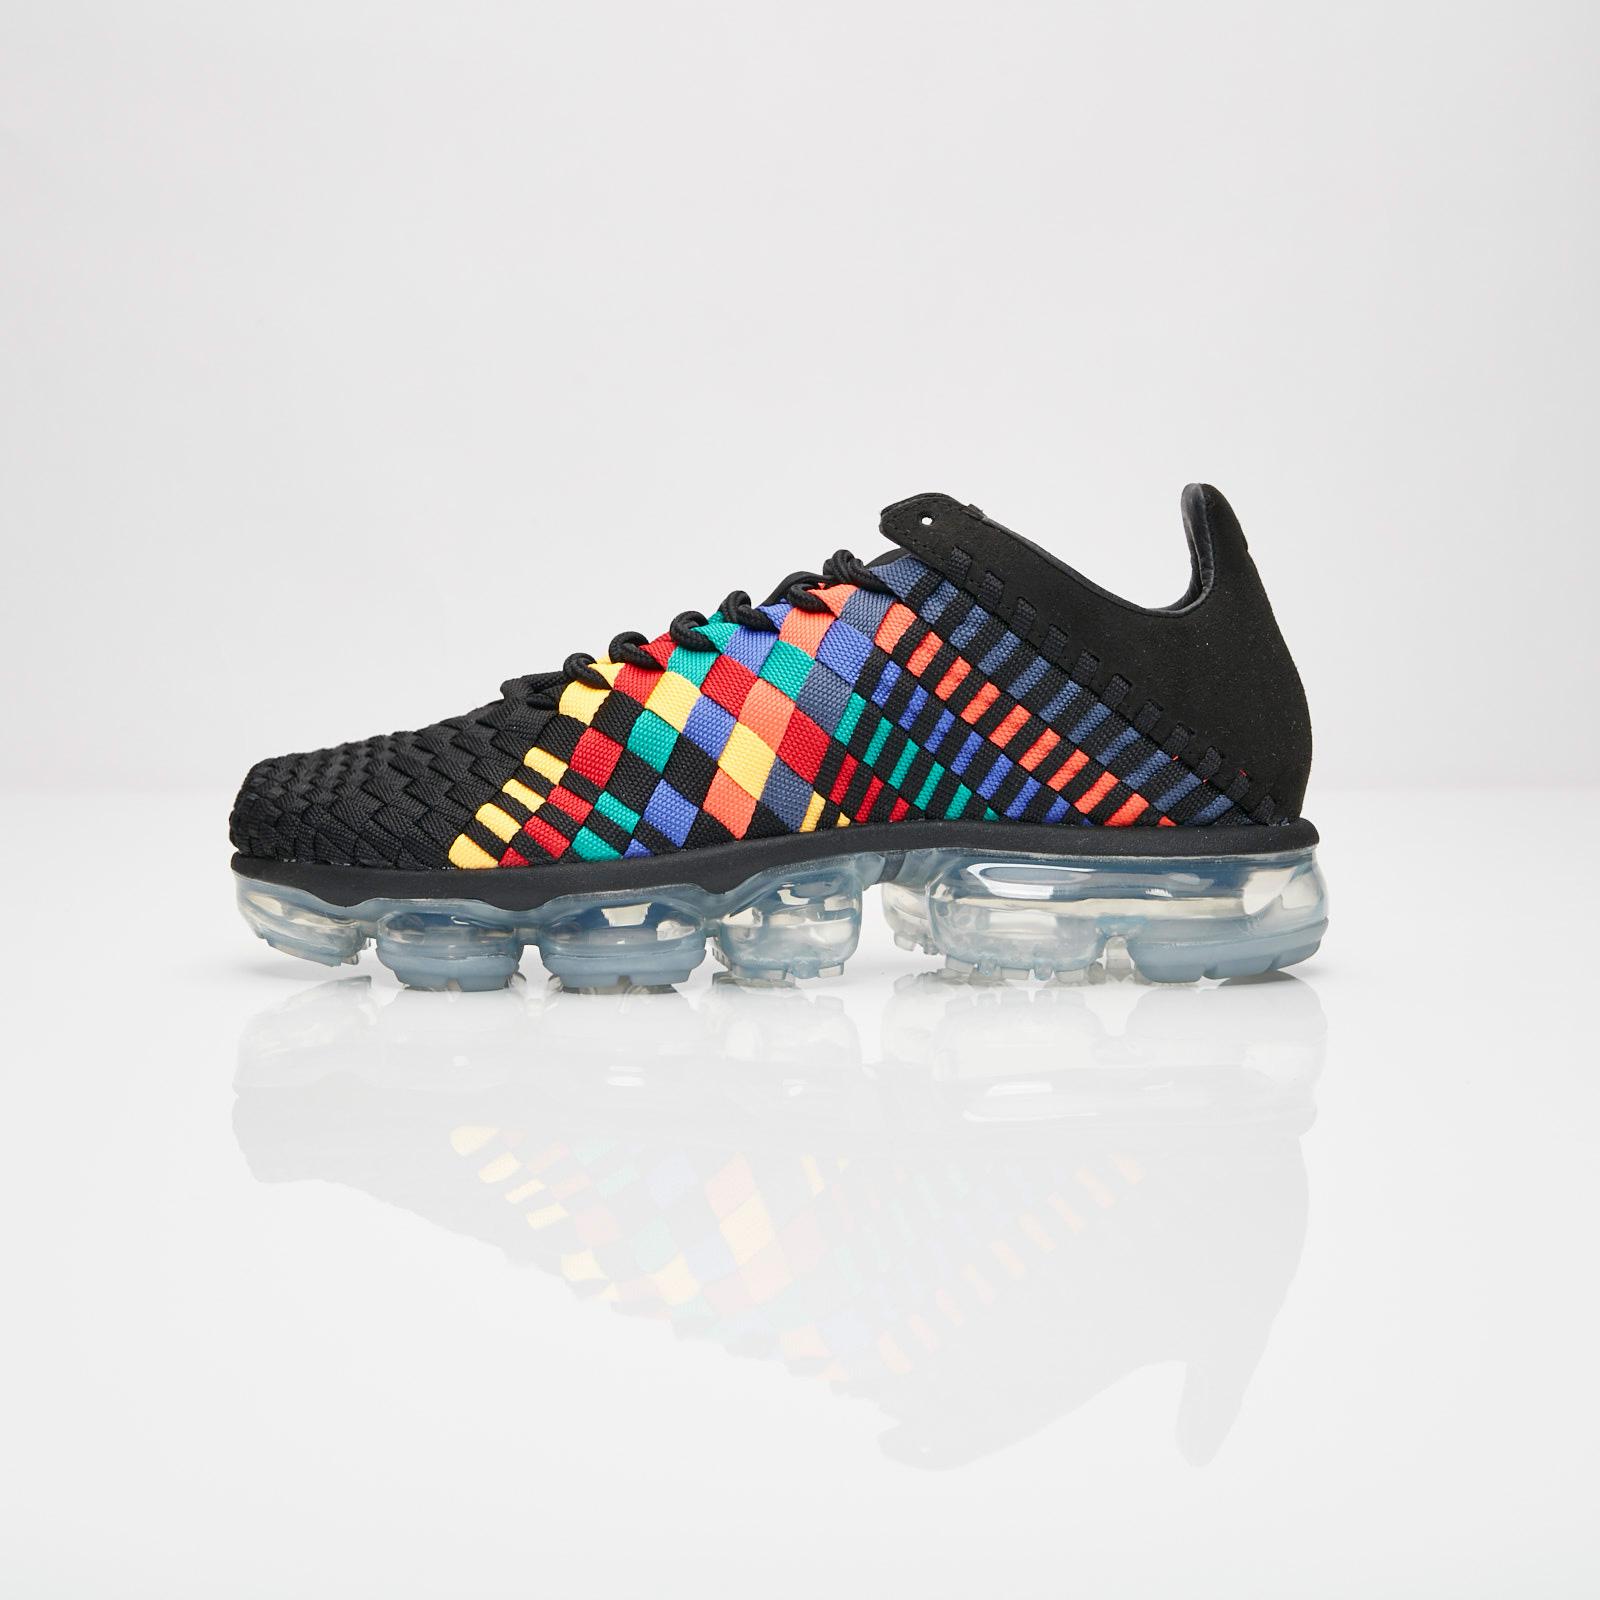 1e2c3014c816d Nike Air Vapormax Inneva - Ao2447-001 - Sneakersnstuff